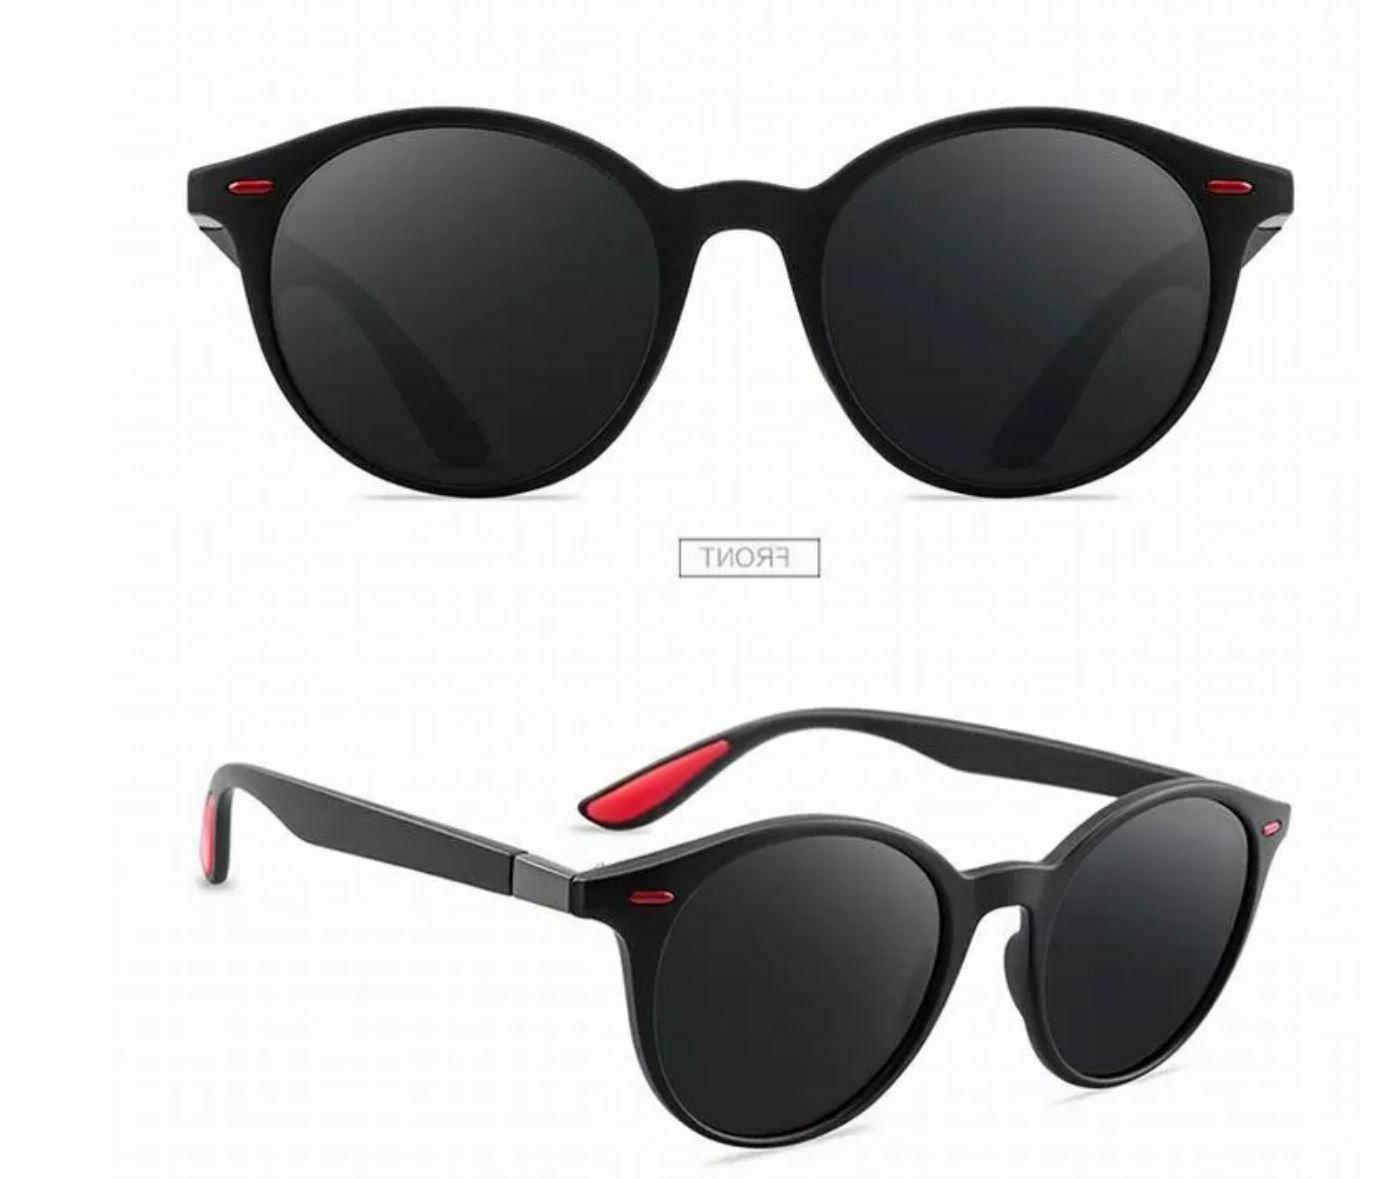 Men's Polarized Sunglasses Light Round Classic Fashion